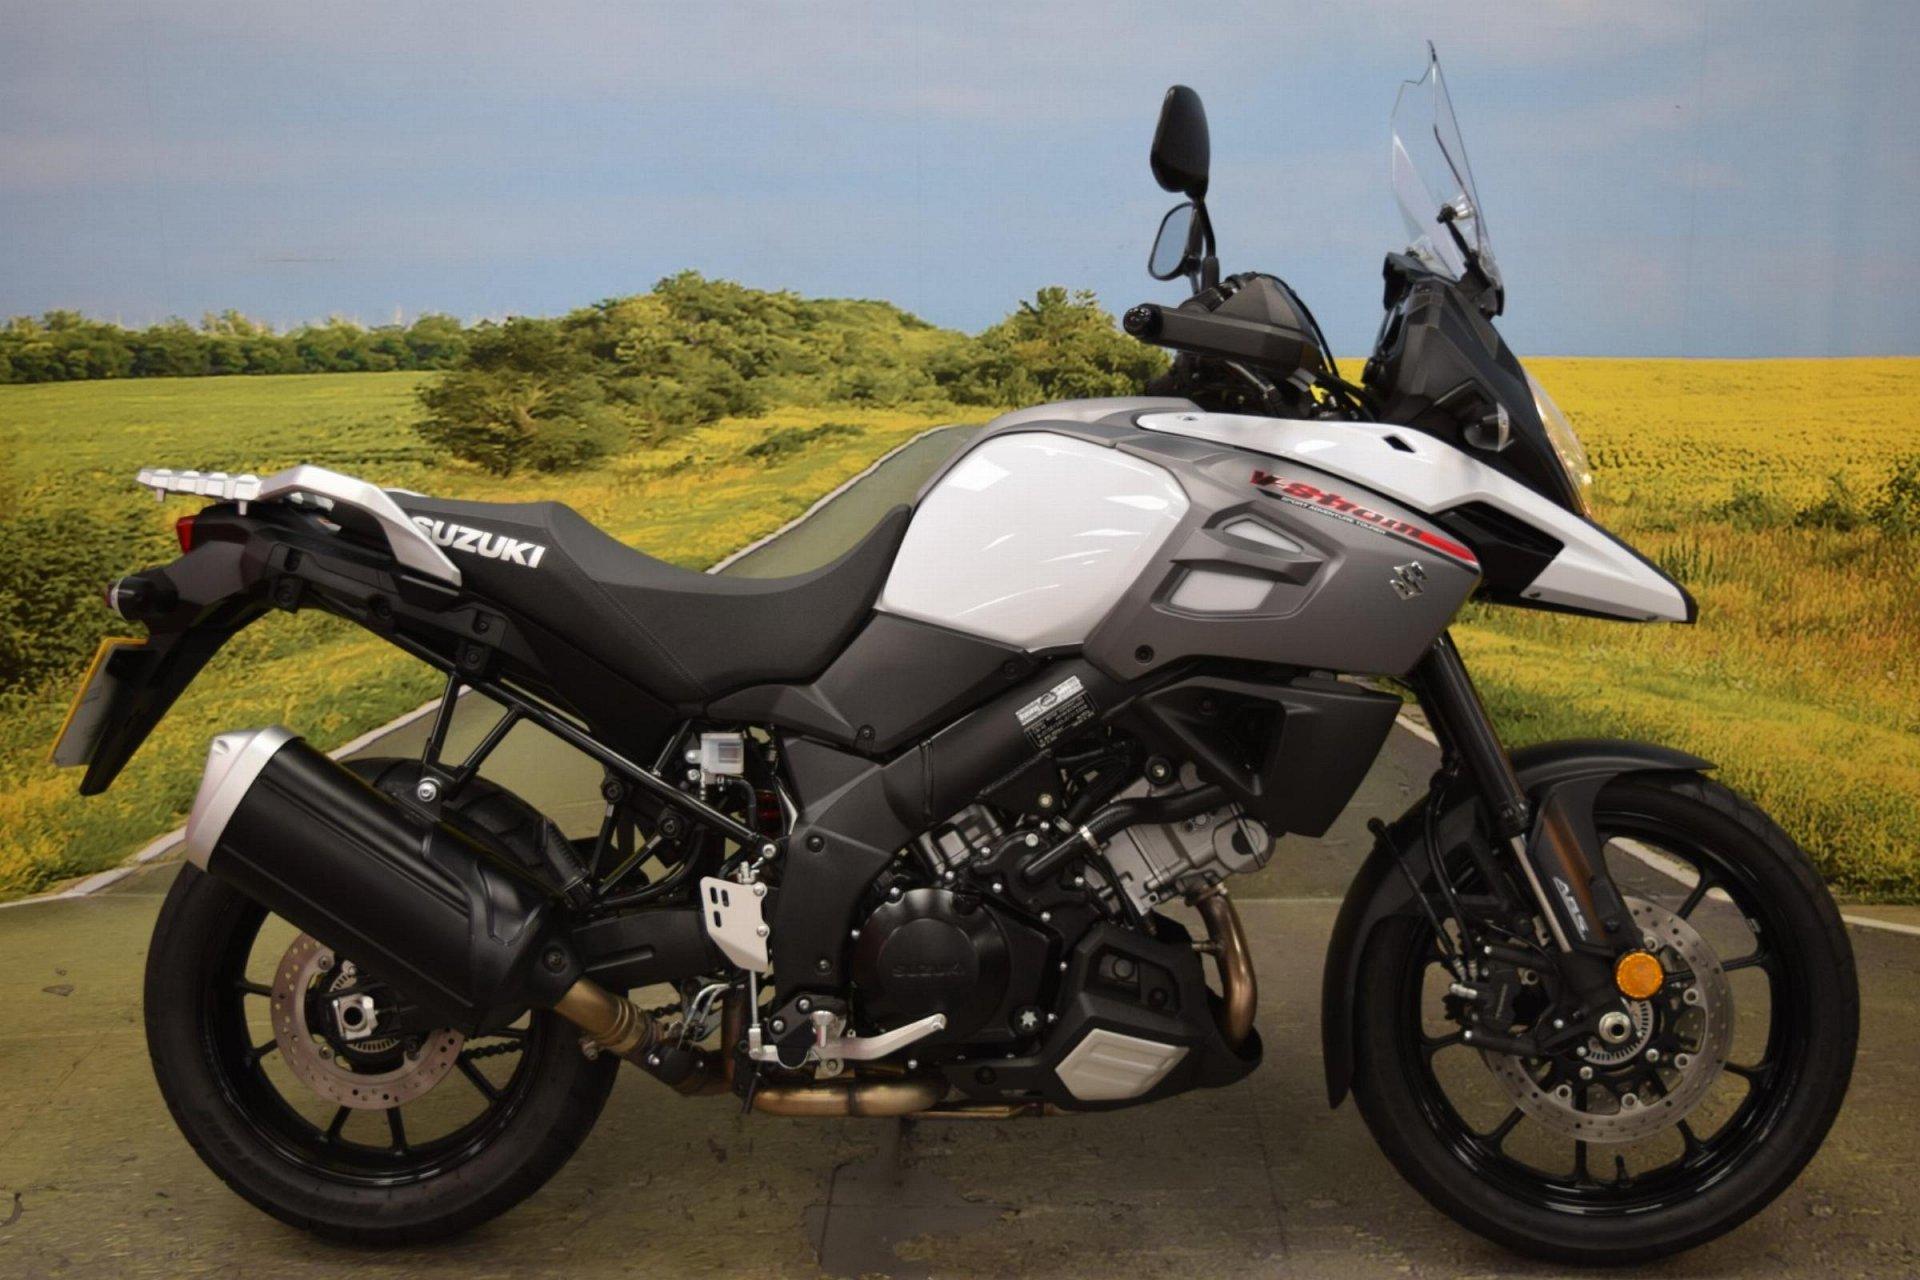 2017 Suzuki V Strom 1000 for sale in Staffordshire